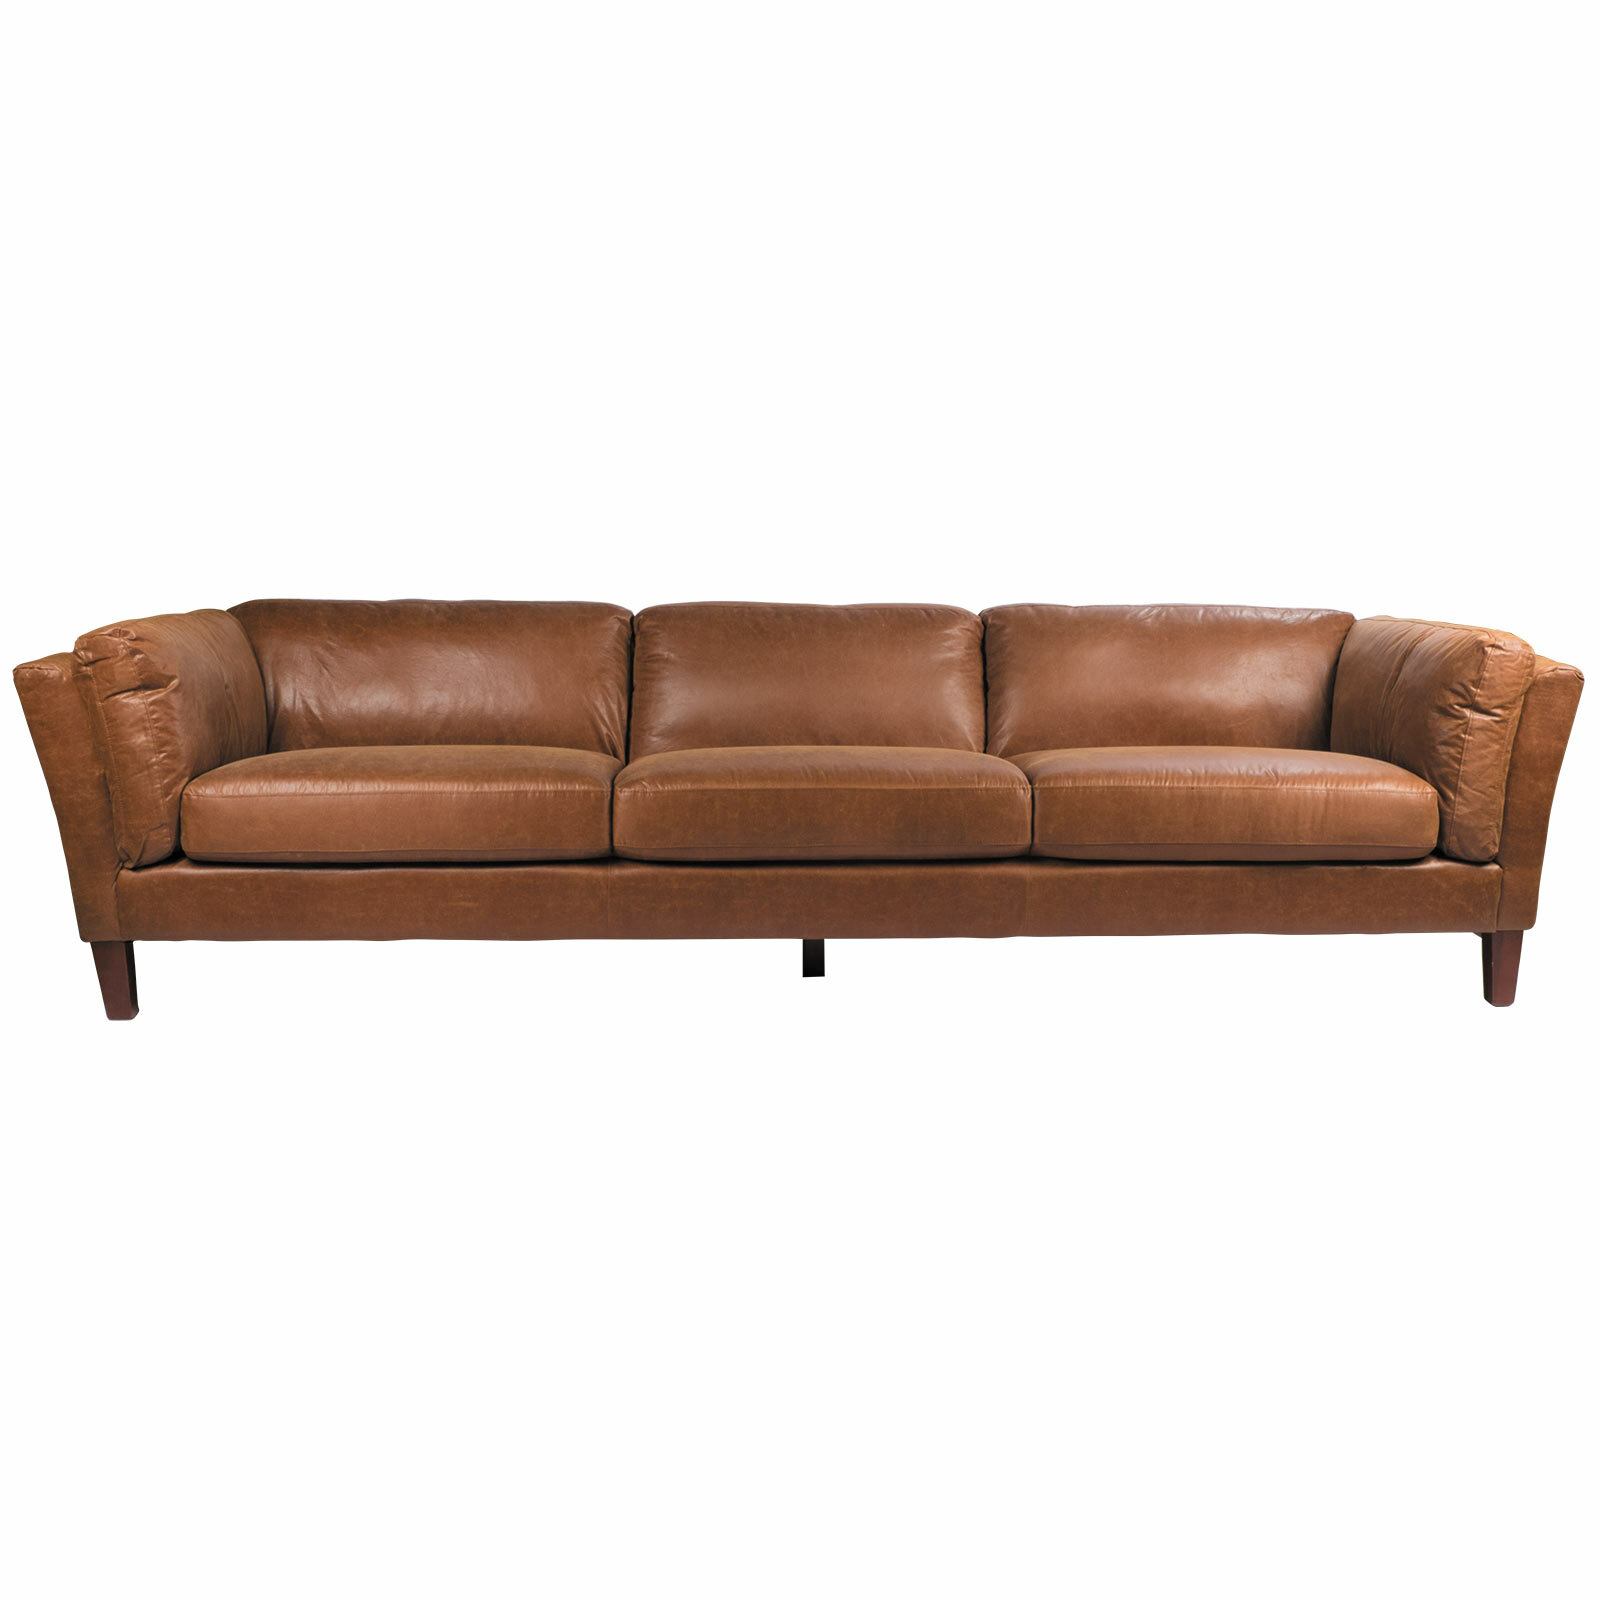 Amazing Alamo Leather Sofa Machost Co Dining Chair Design Ideas Machostcouk